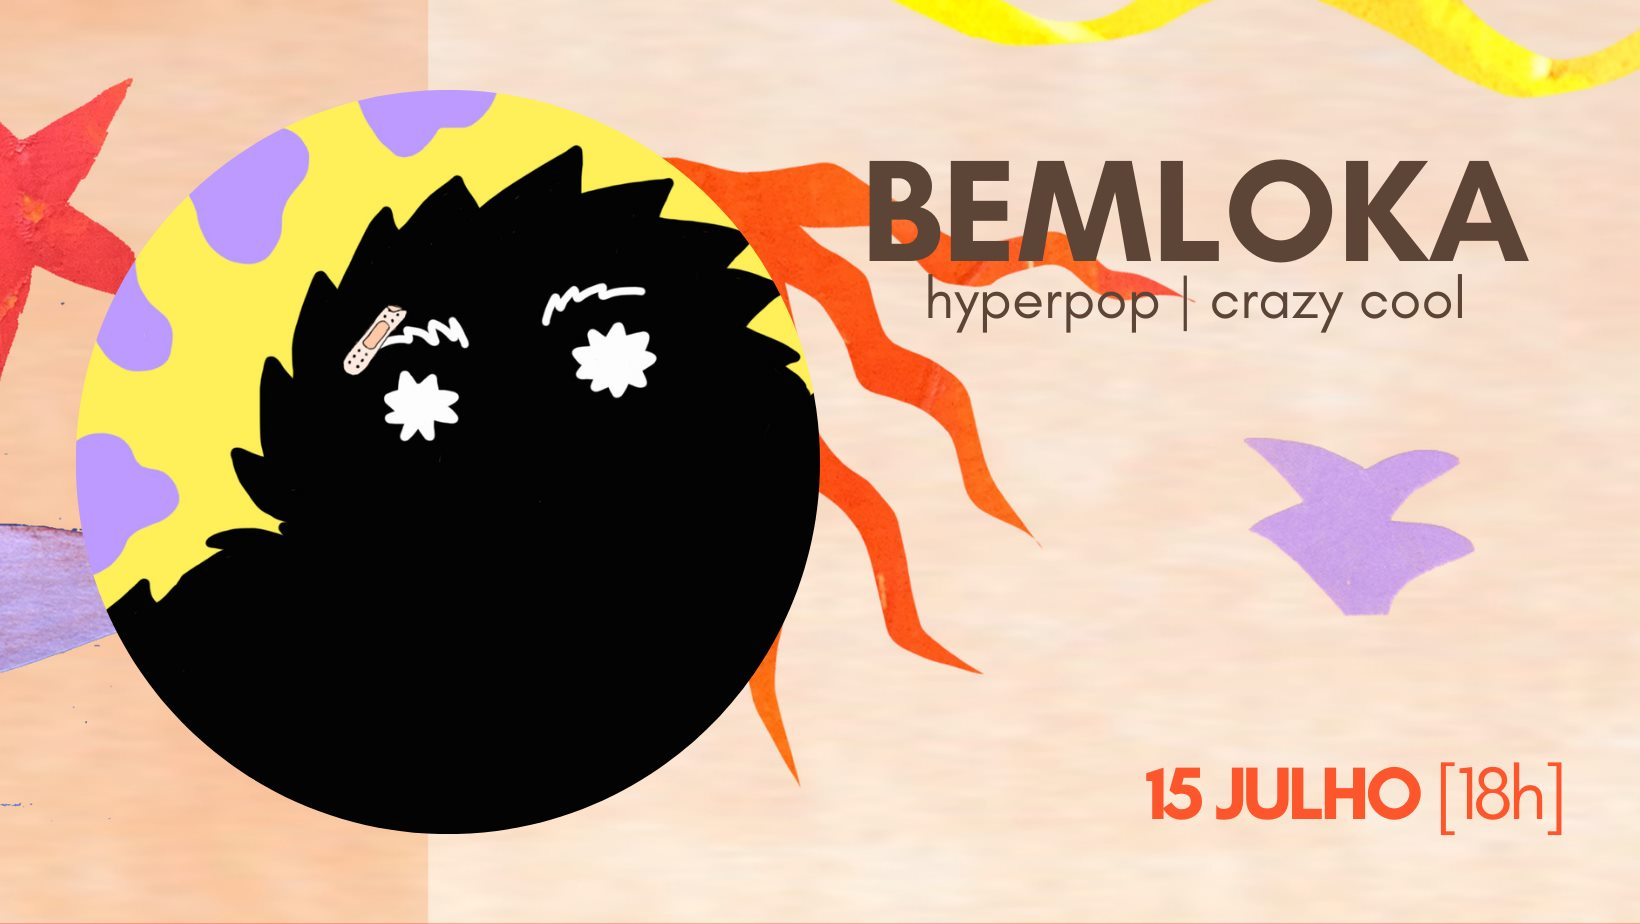 BEMLOKA | hyperpop / crazy cool